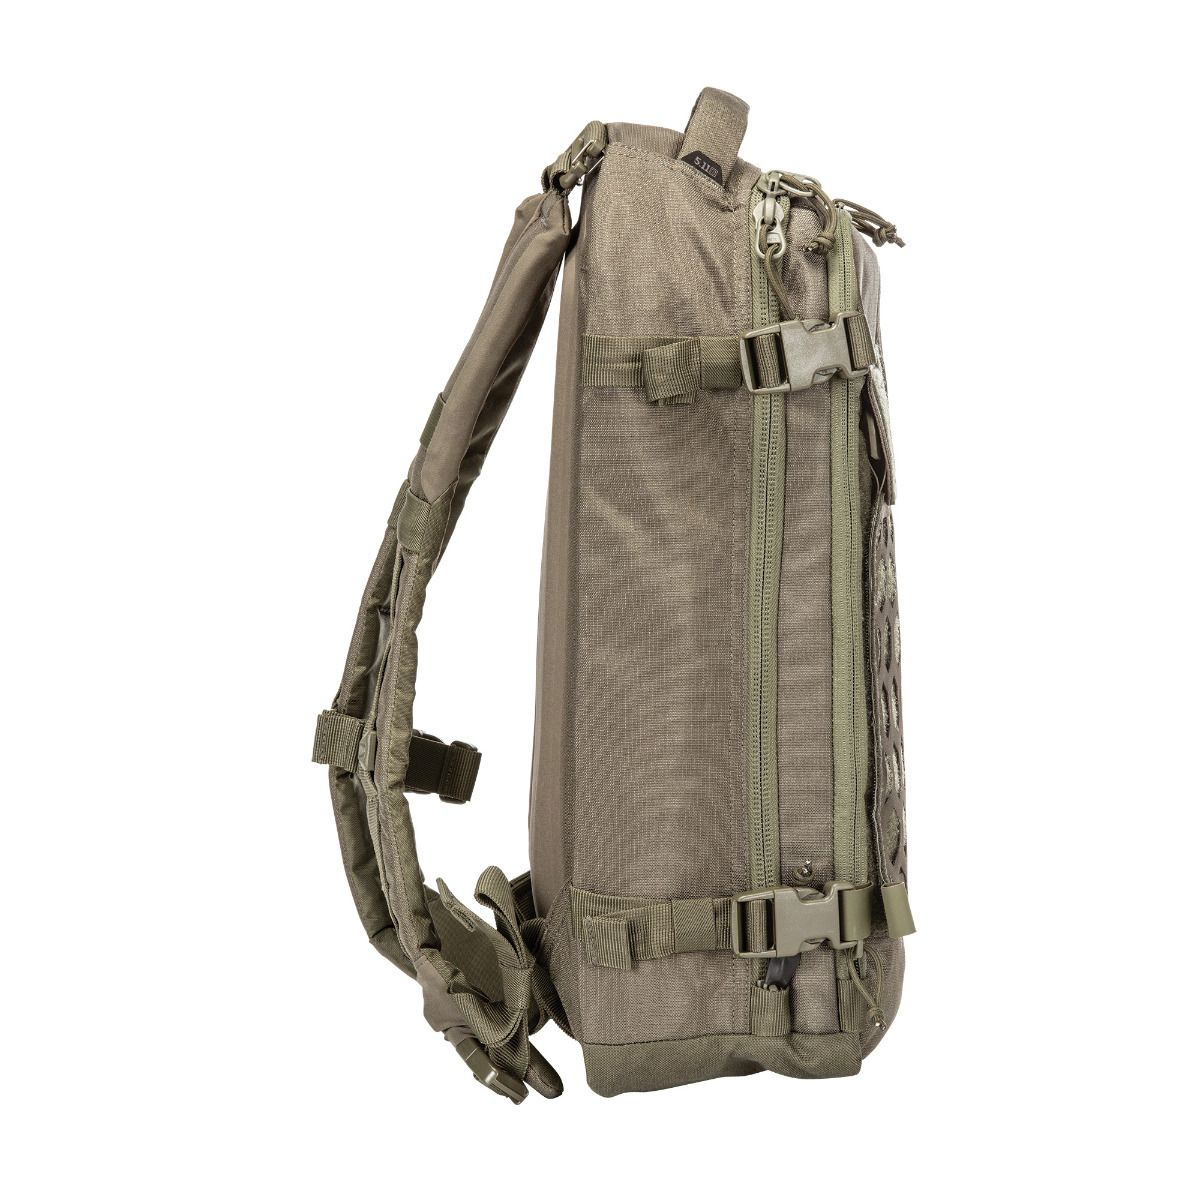 Balo 5.11 Tactical AMP10™ 20L – Ranger Green